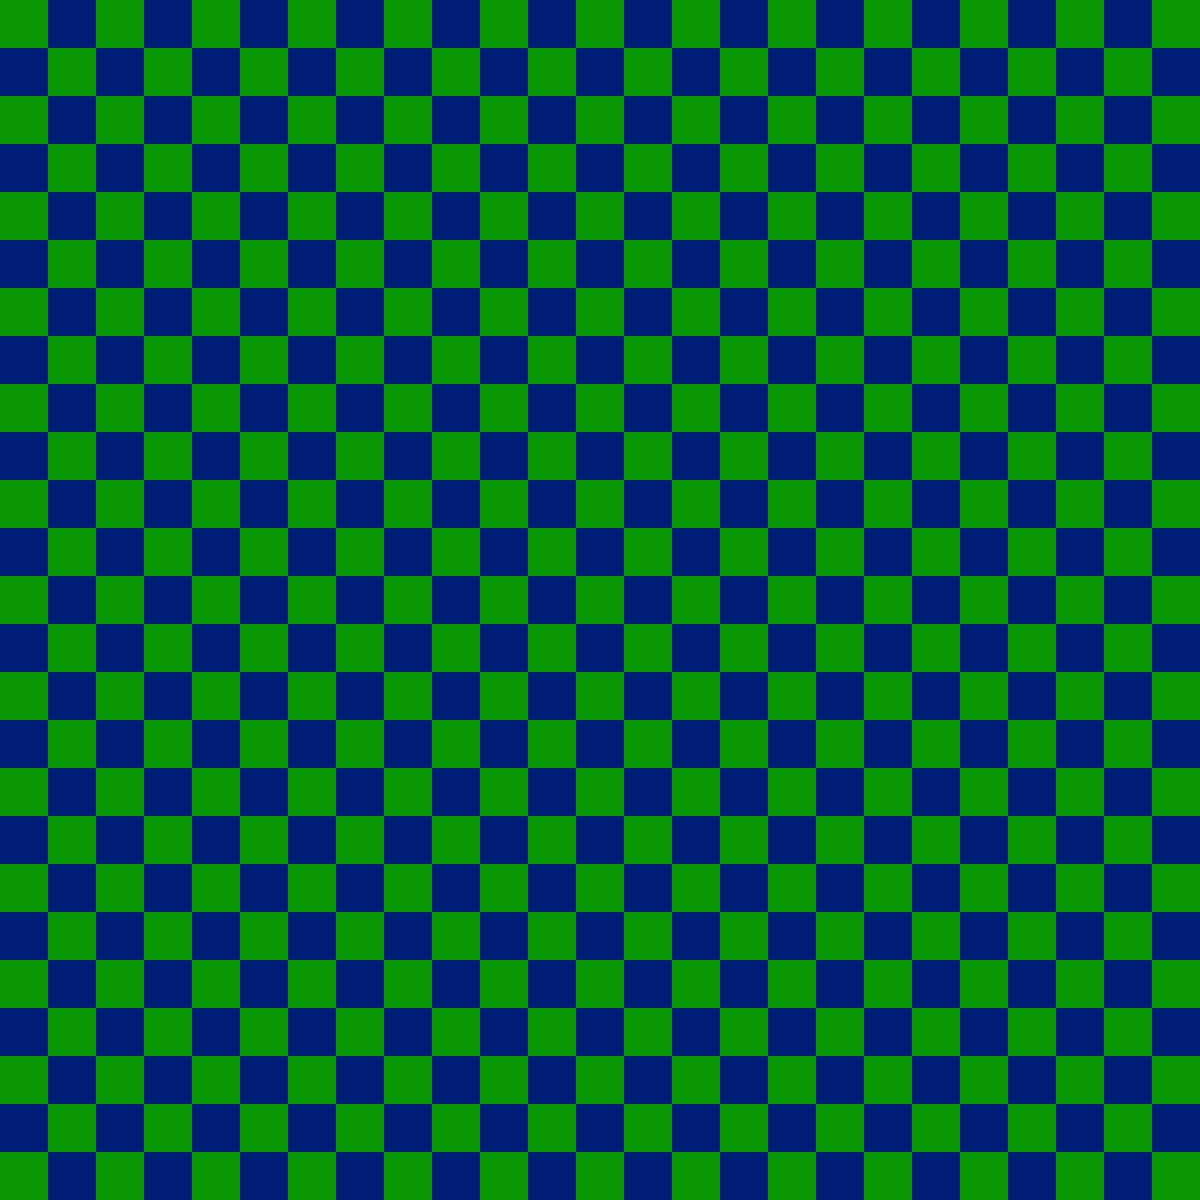 Checkerboard by BookDragon